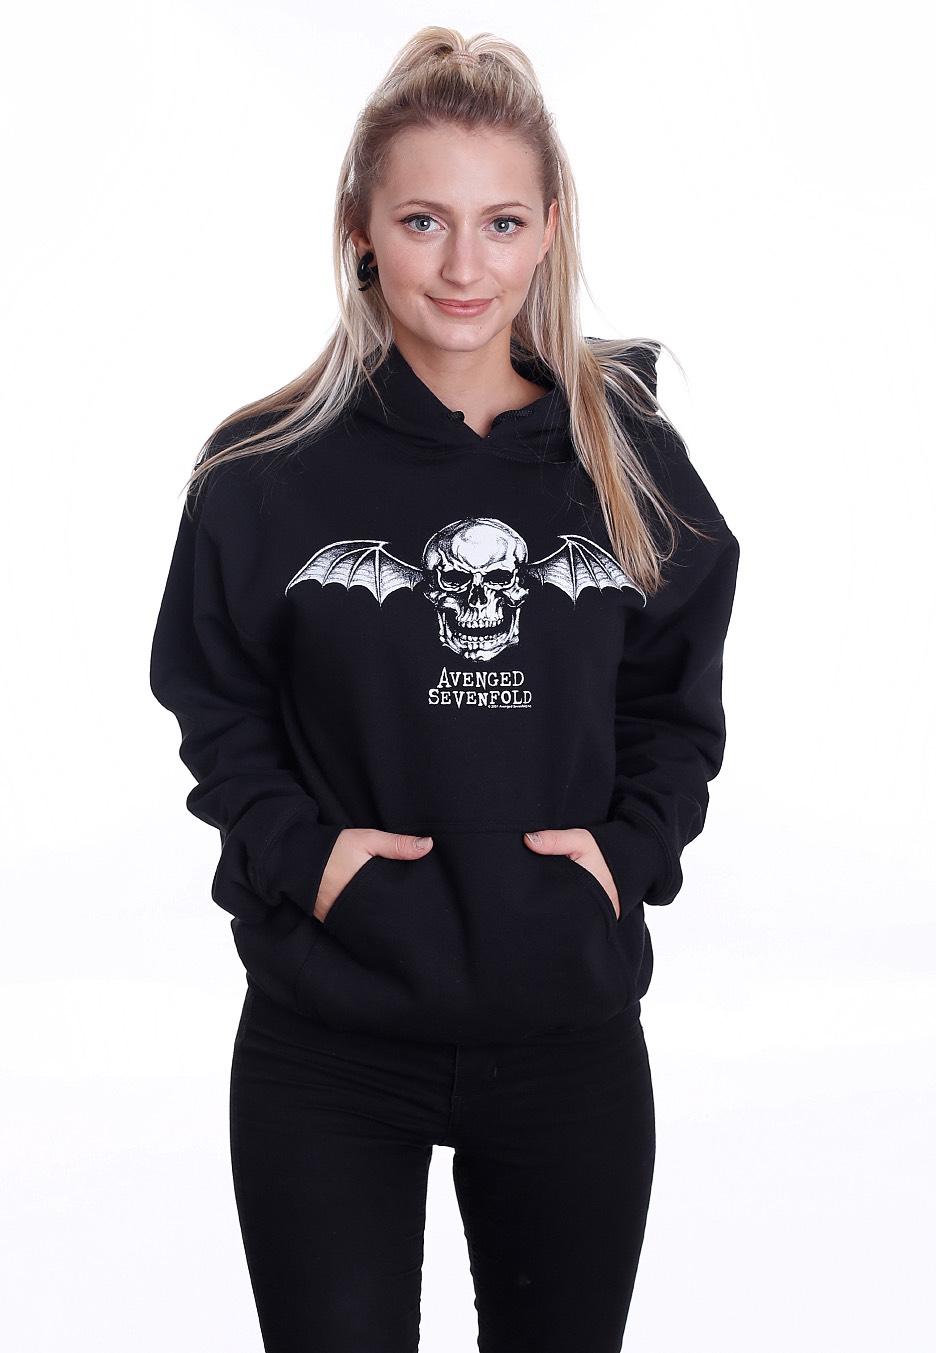 Metal Sevenfold Cappuccio Felpa Logo Bat Death Con Avenged vw0Fqdq